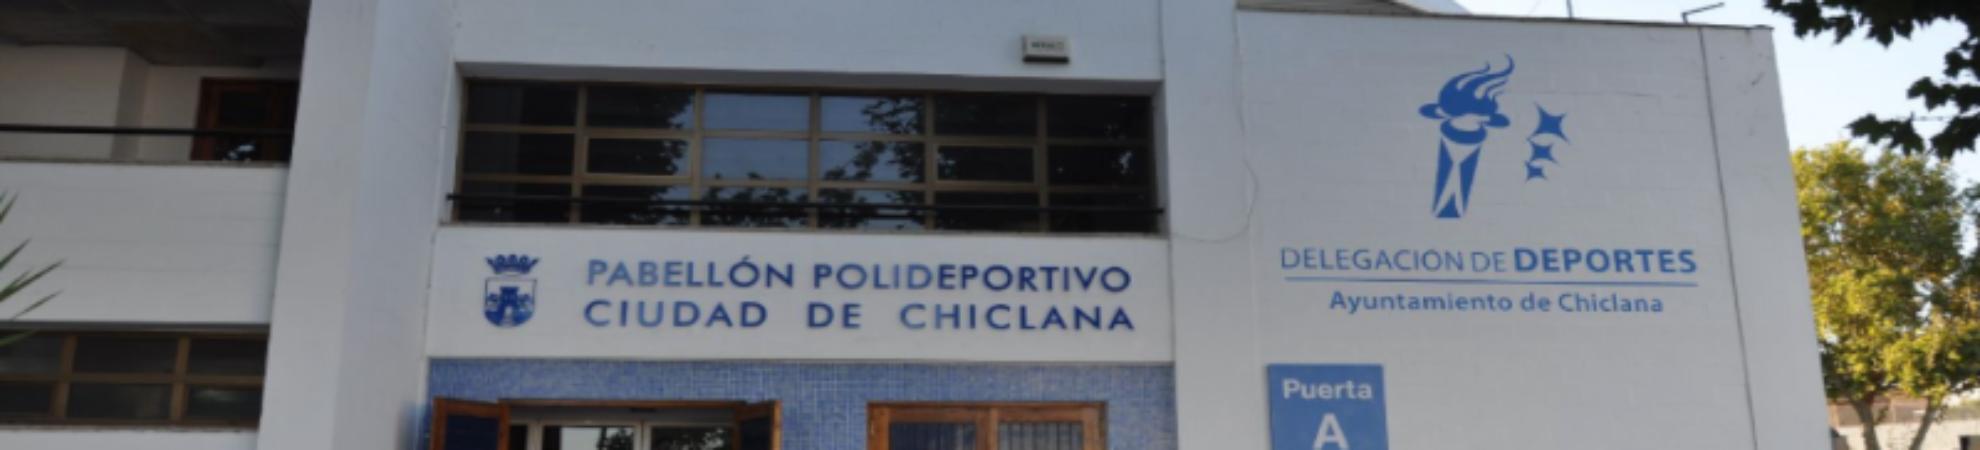 Pabellón Deportivo Chiclana